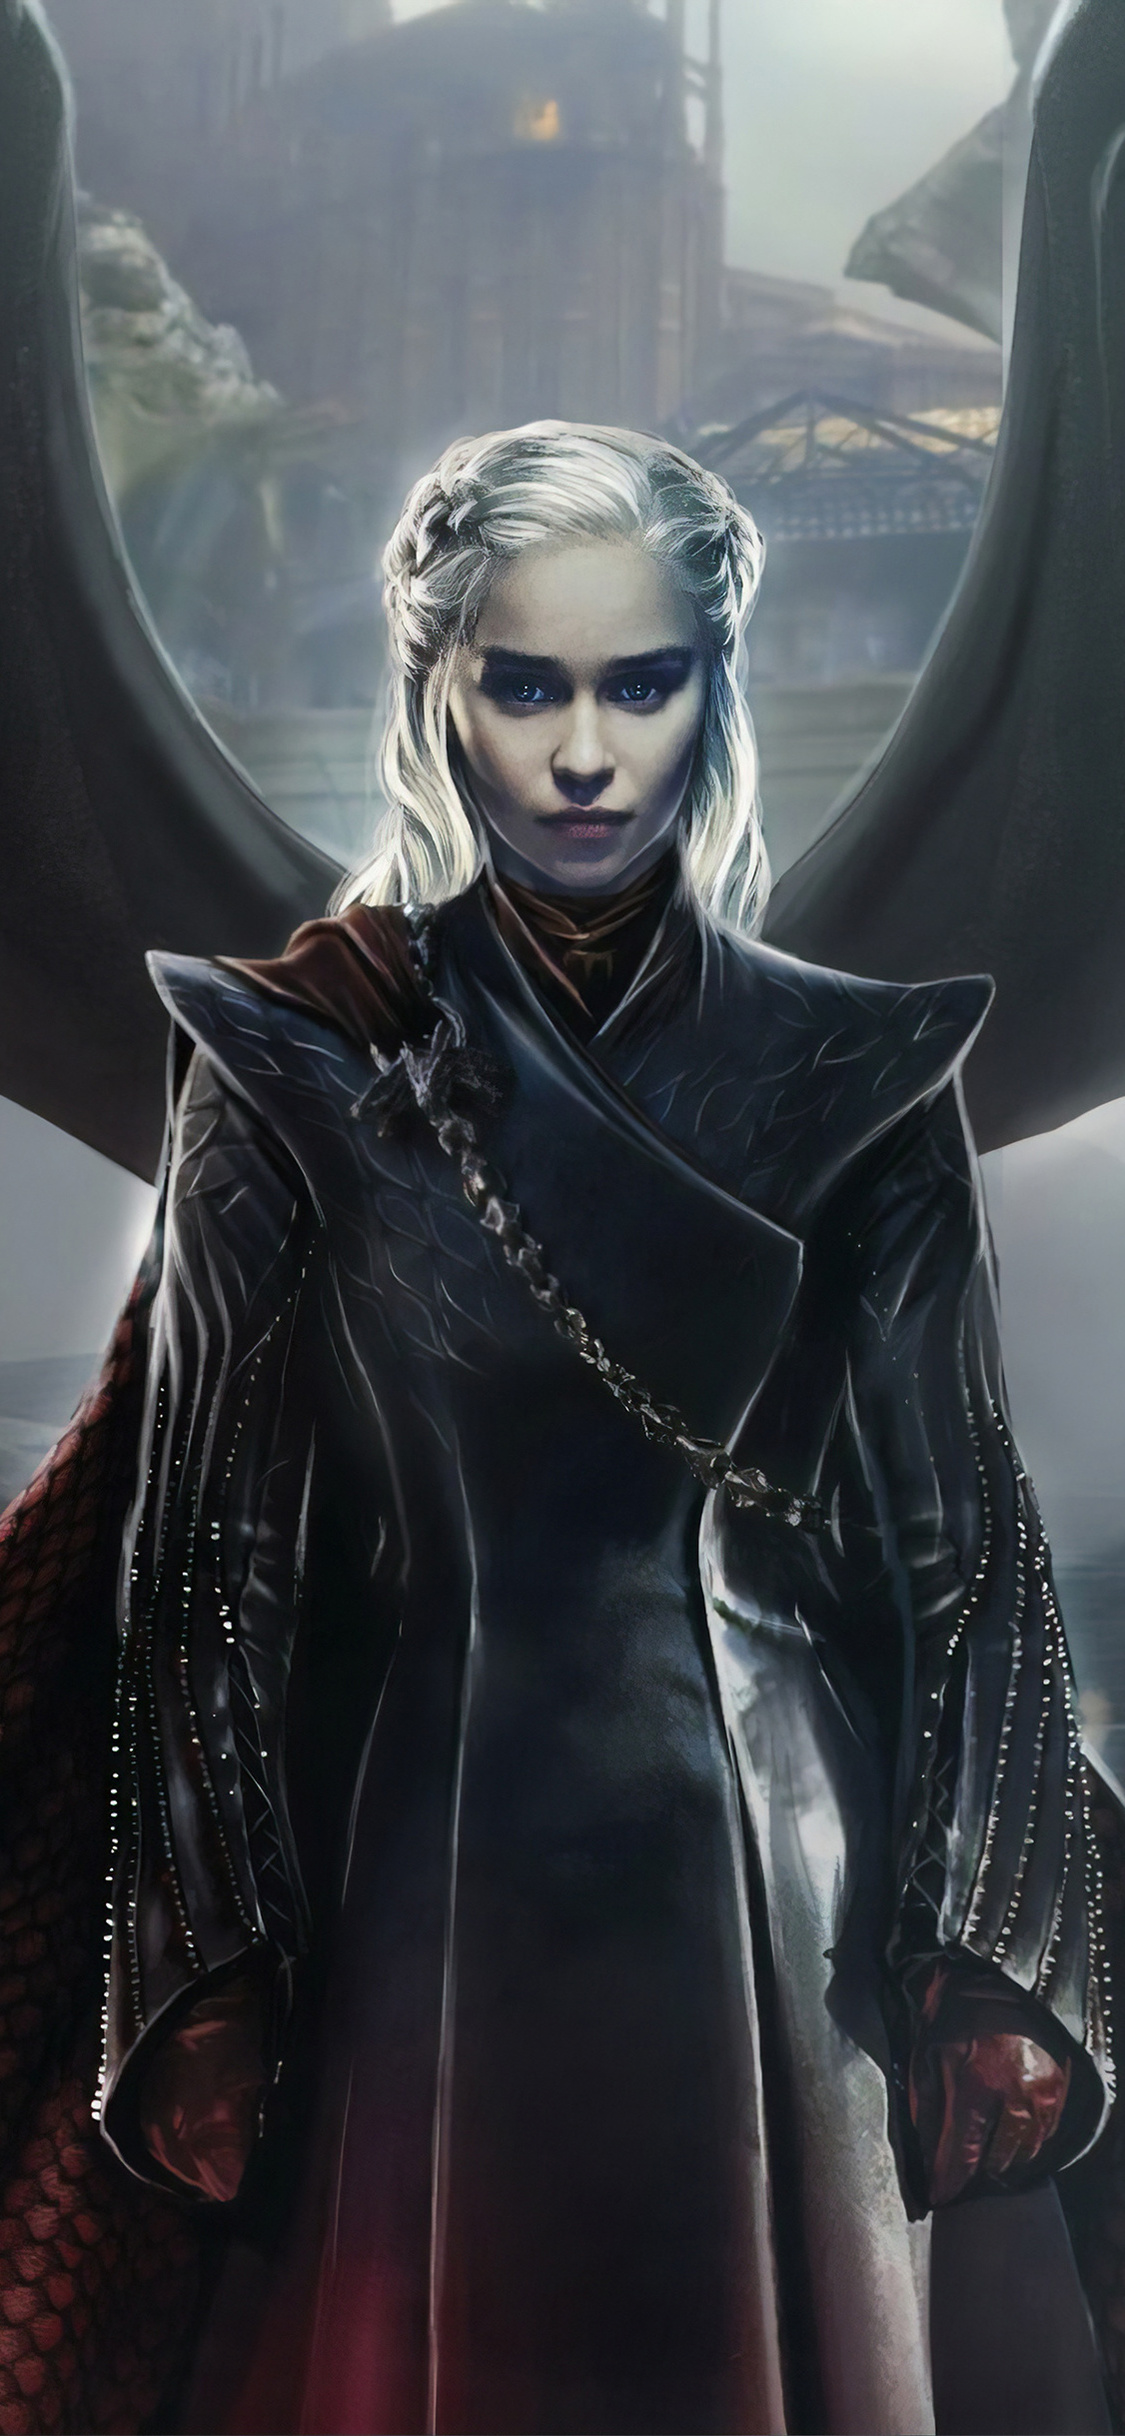 1125x2436 Daenerys Targaryen Game Of Thrones 4k Iphone Xs